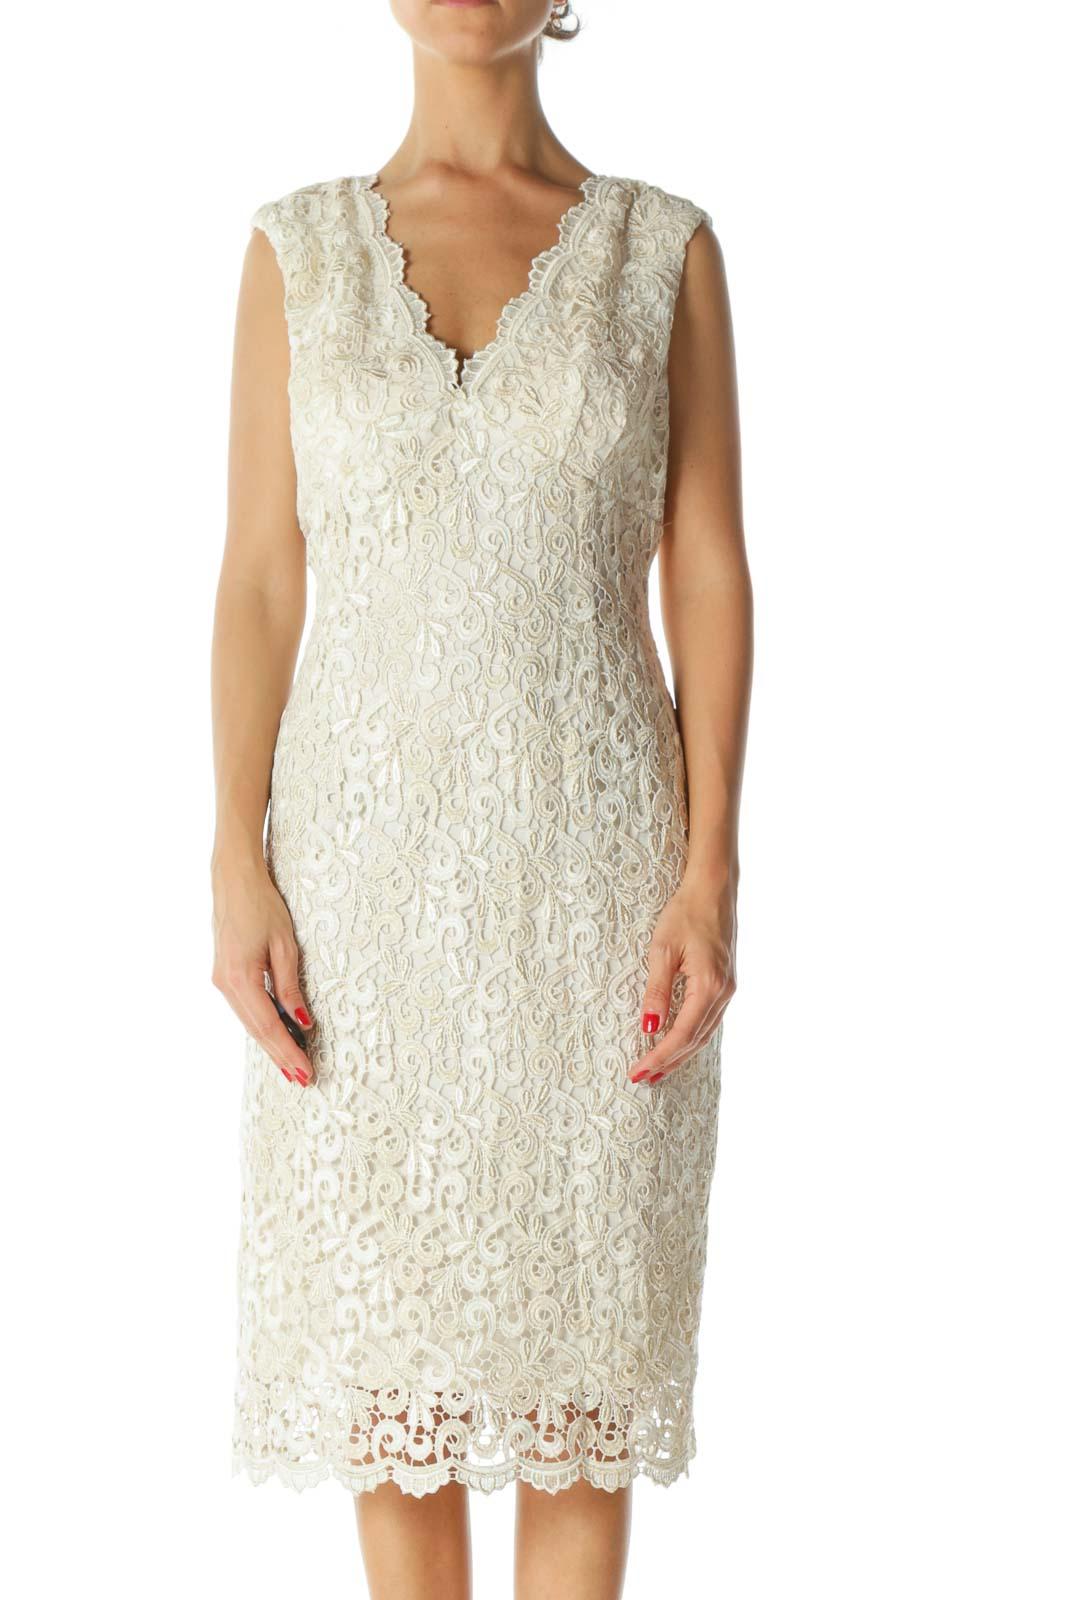 Cream Embroidered Metallic Dress